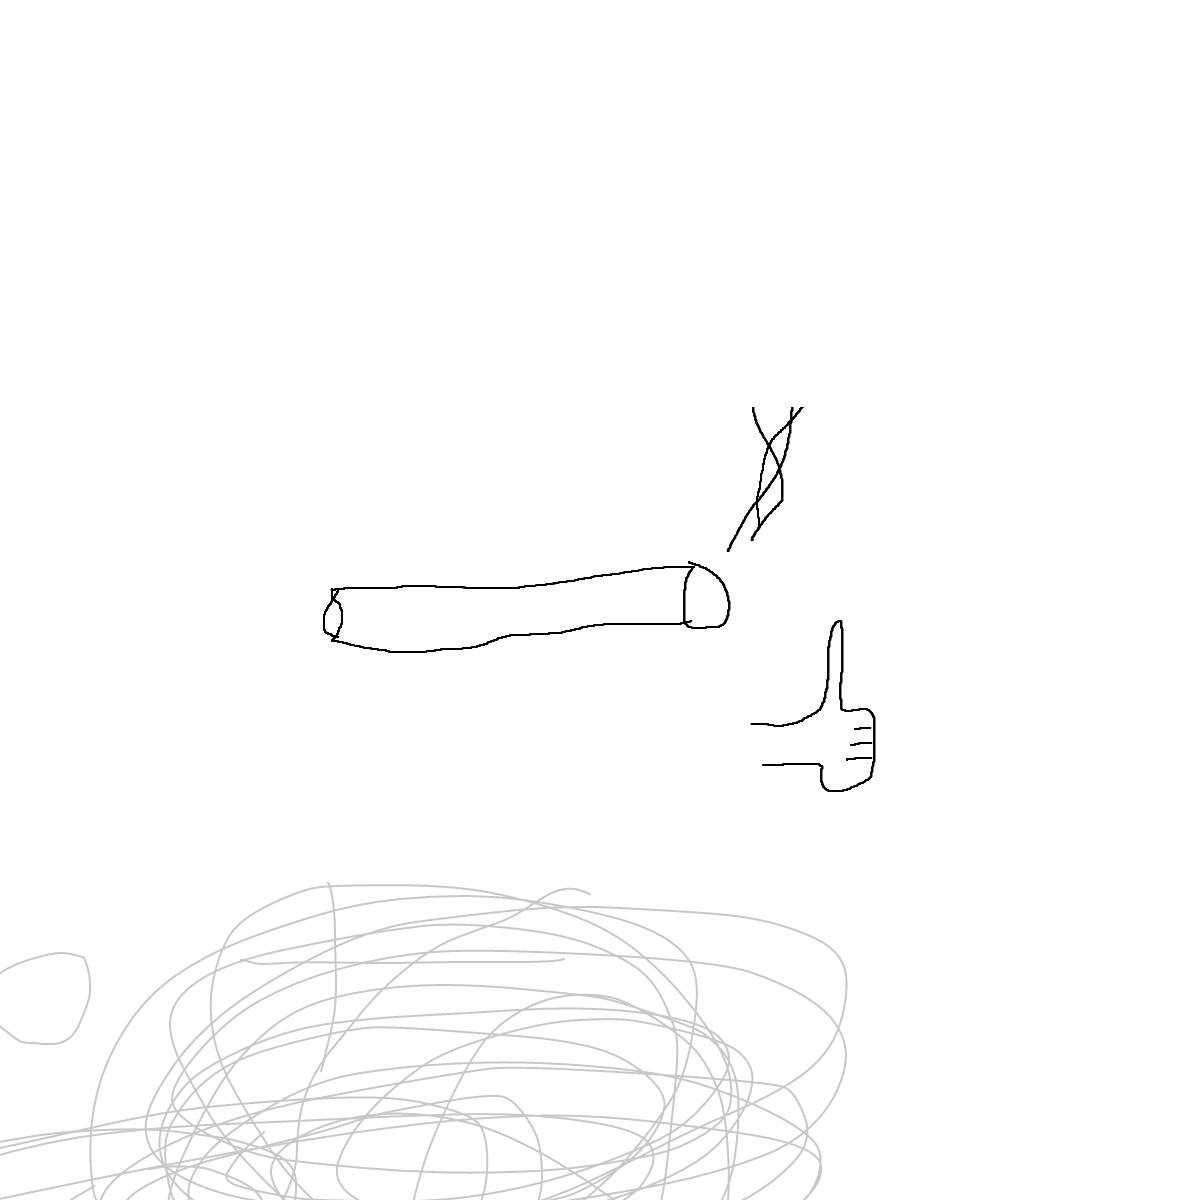 BAAAM drawing#11175 lat:-27.4976692199707030lng: 153.0129394531250000